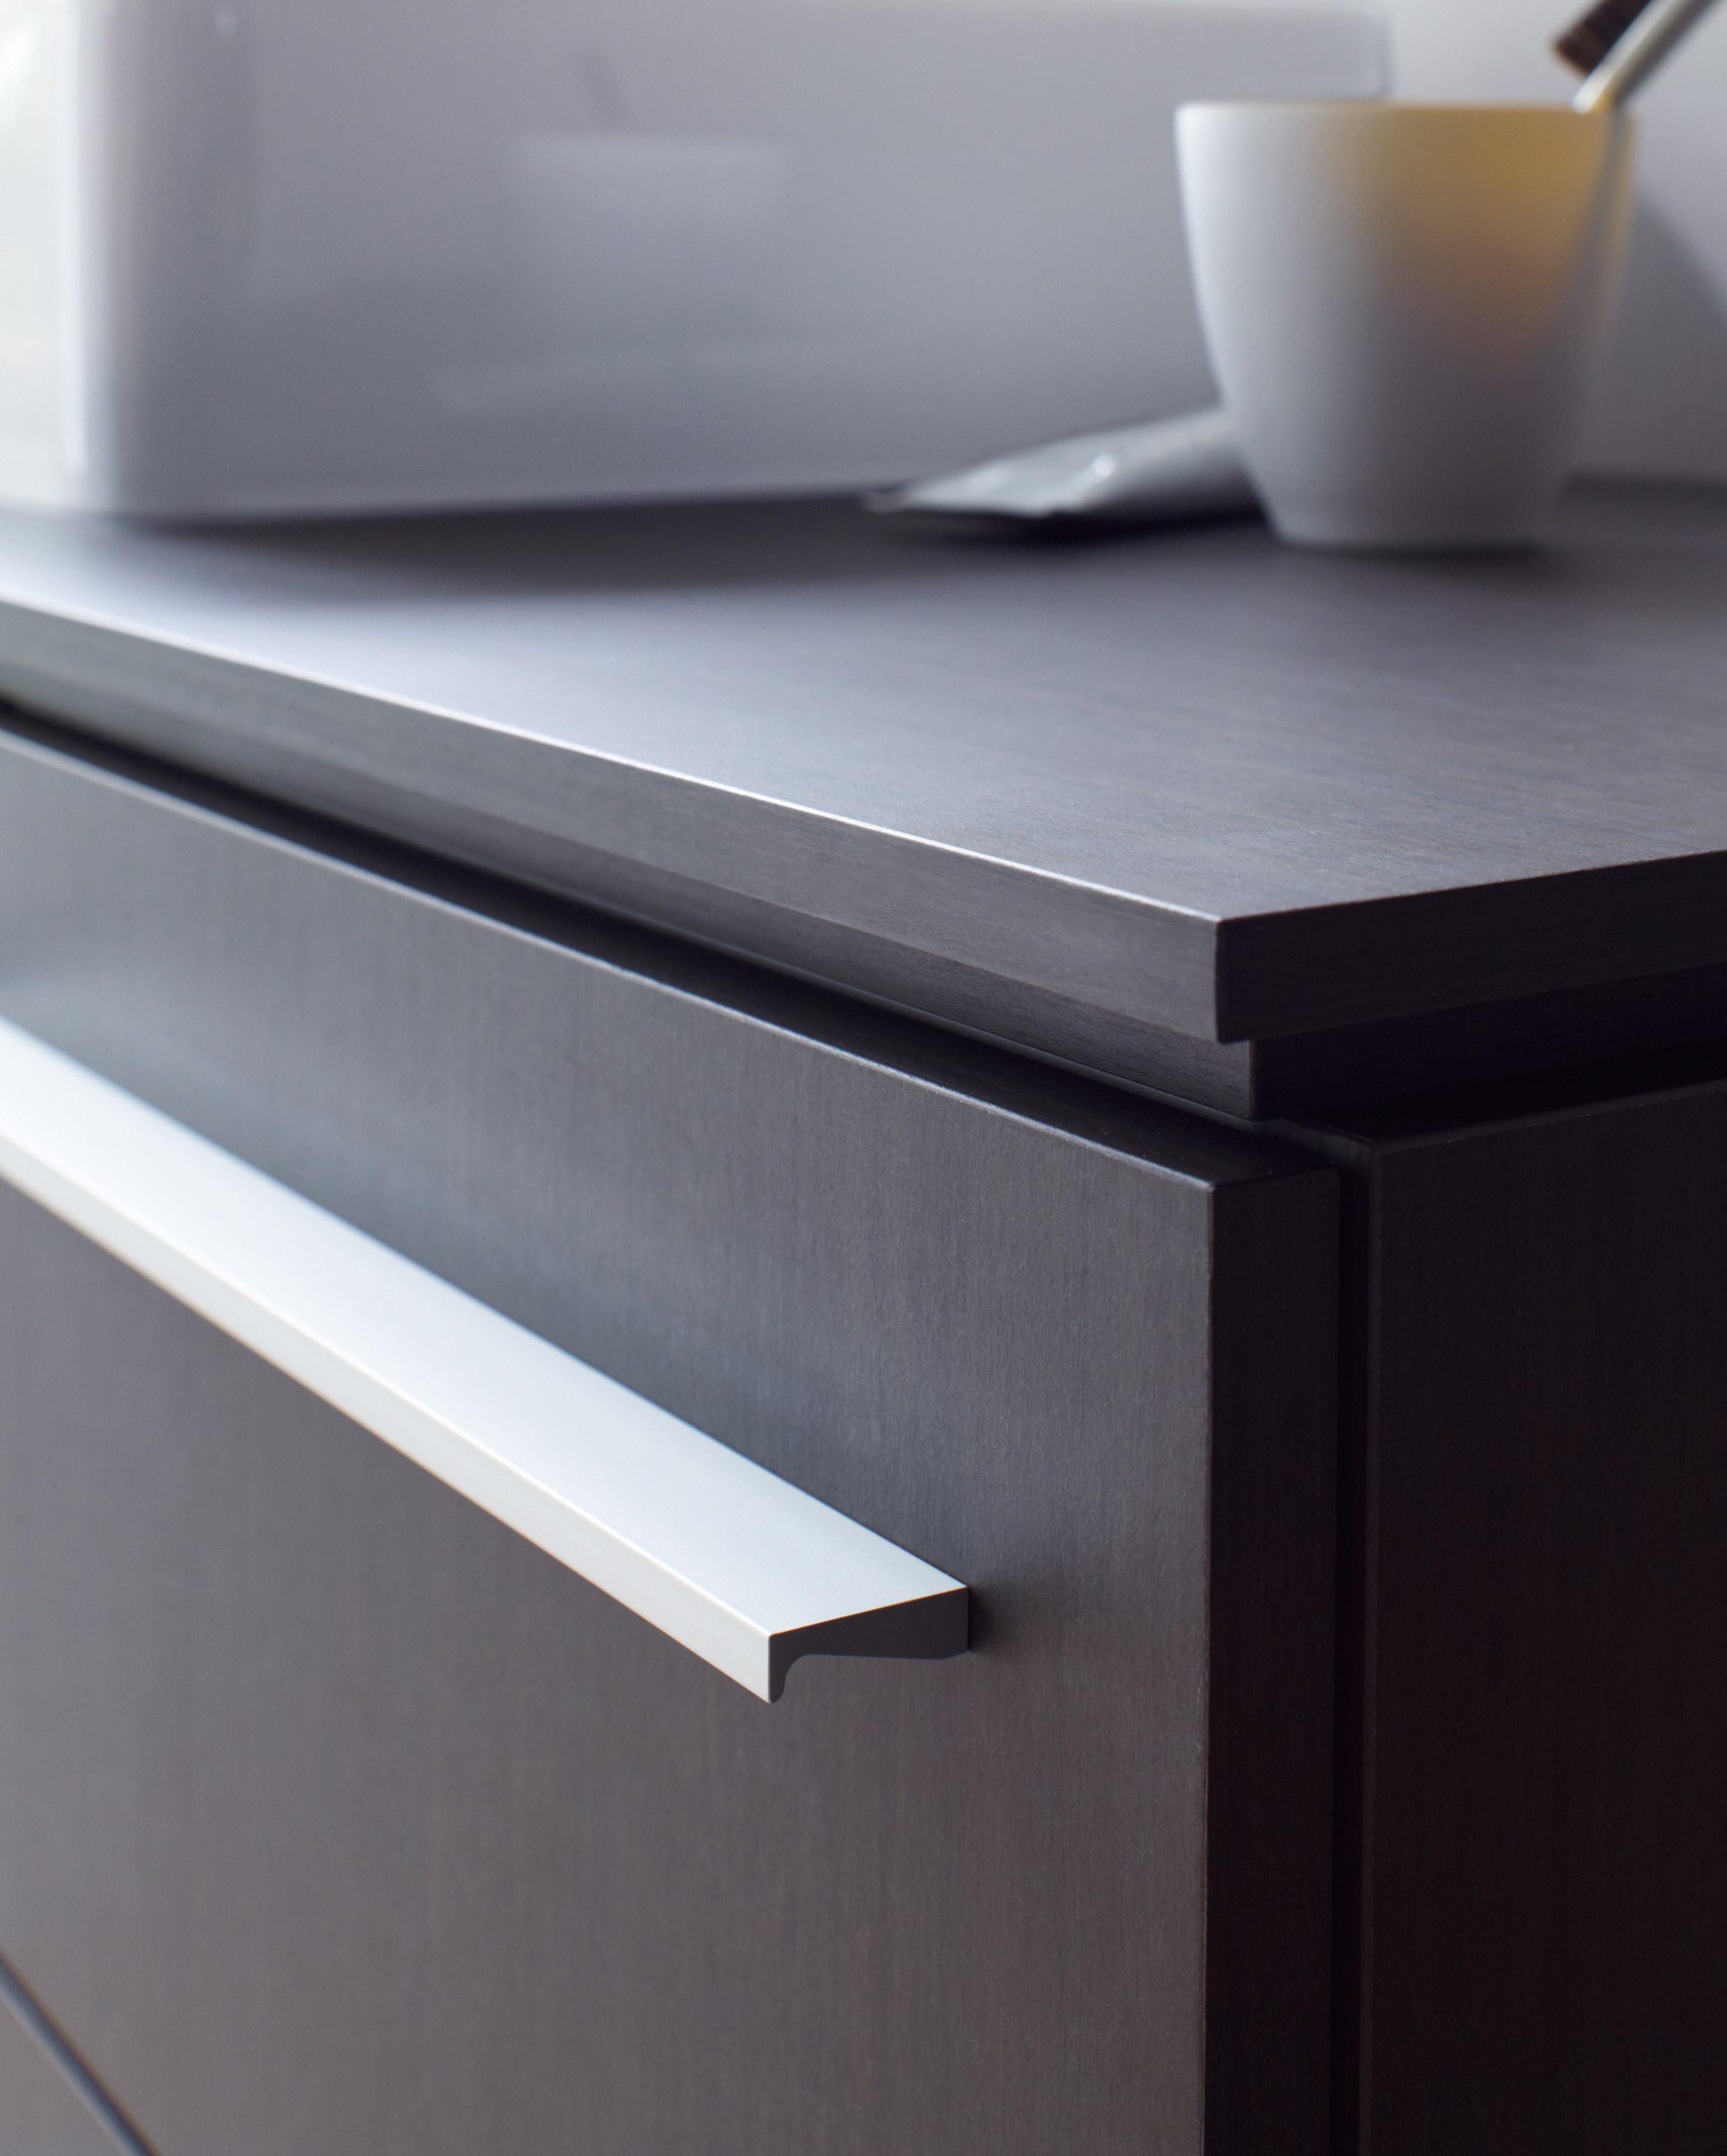 duravit x large bathroom furniture with extra storage duravit. Black Bedroom Furniture Sets. Home Design Ideas